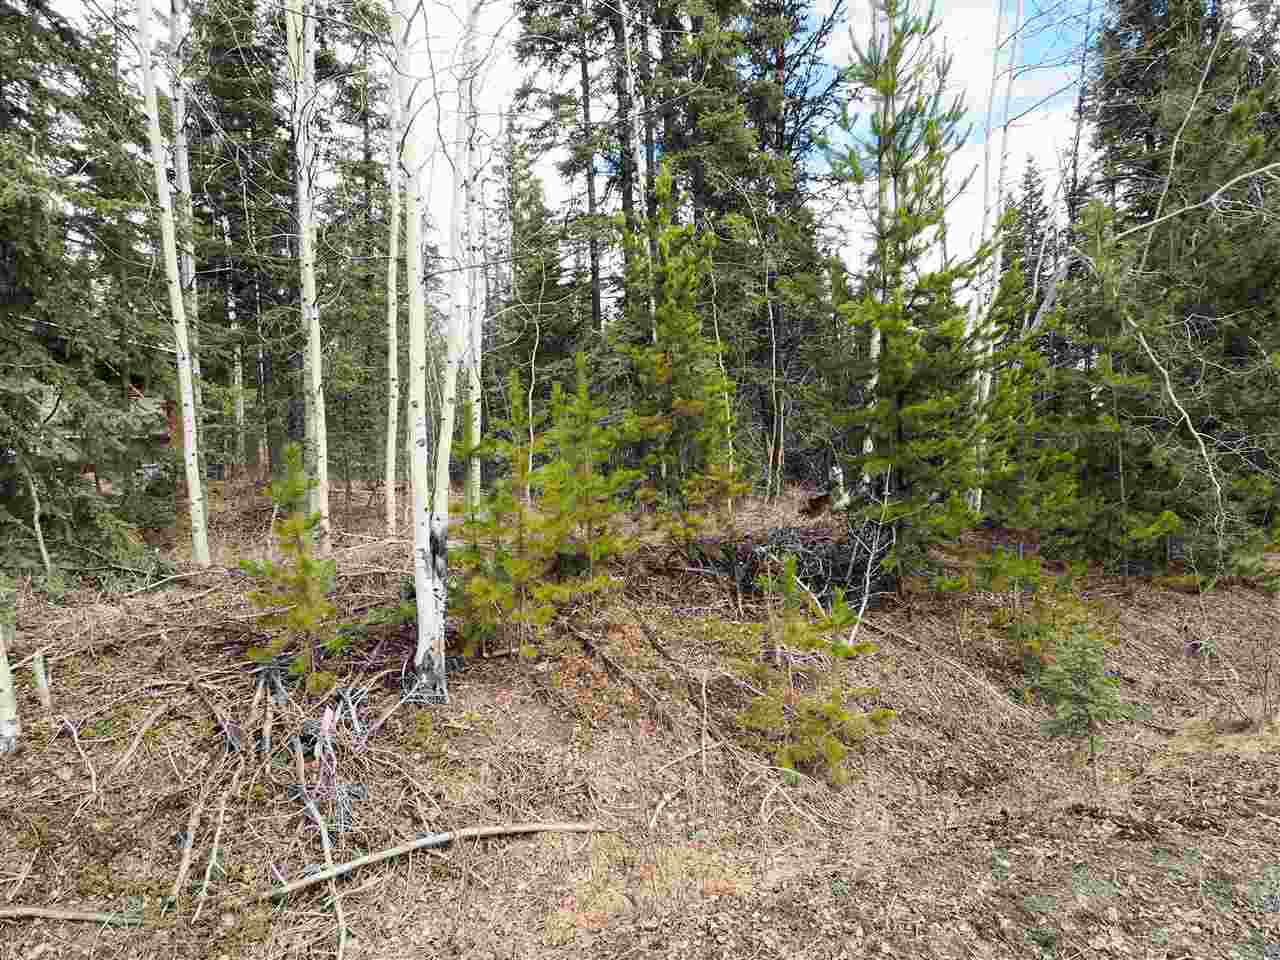 Photo 4: Photos: LOT 216 LUDLOM Road: Deka Lake / Sulphurous / Hathaway Lakes Land for sale (100 Mile House (Zone 10))  : MLS®# R2397846